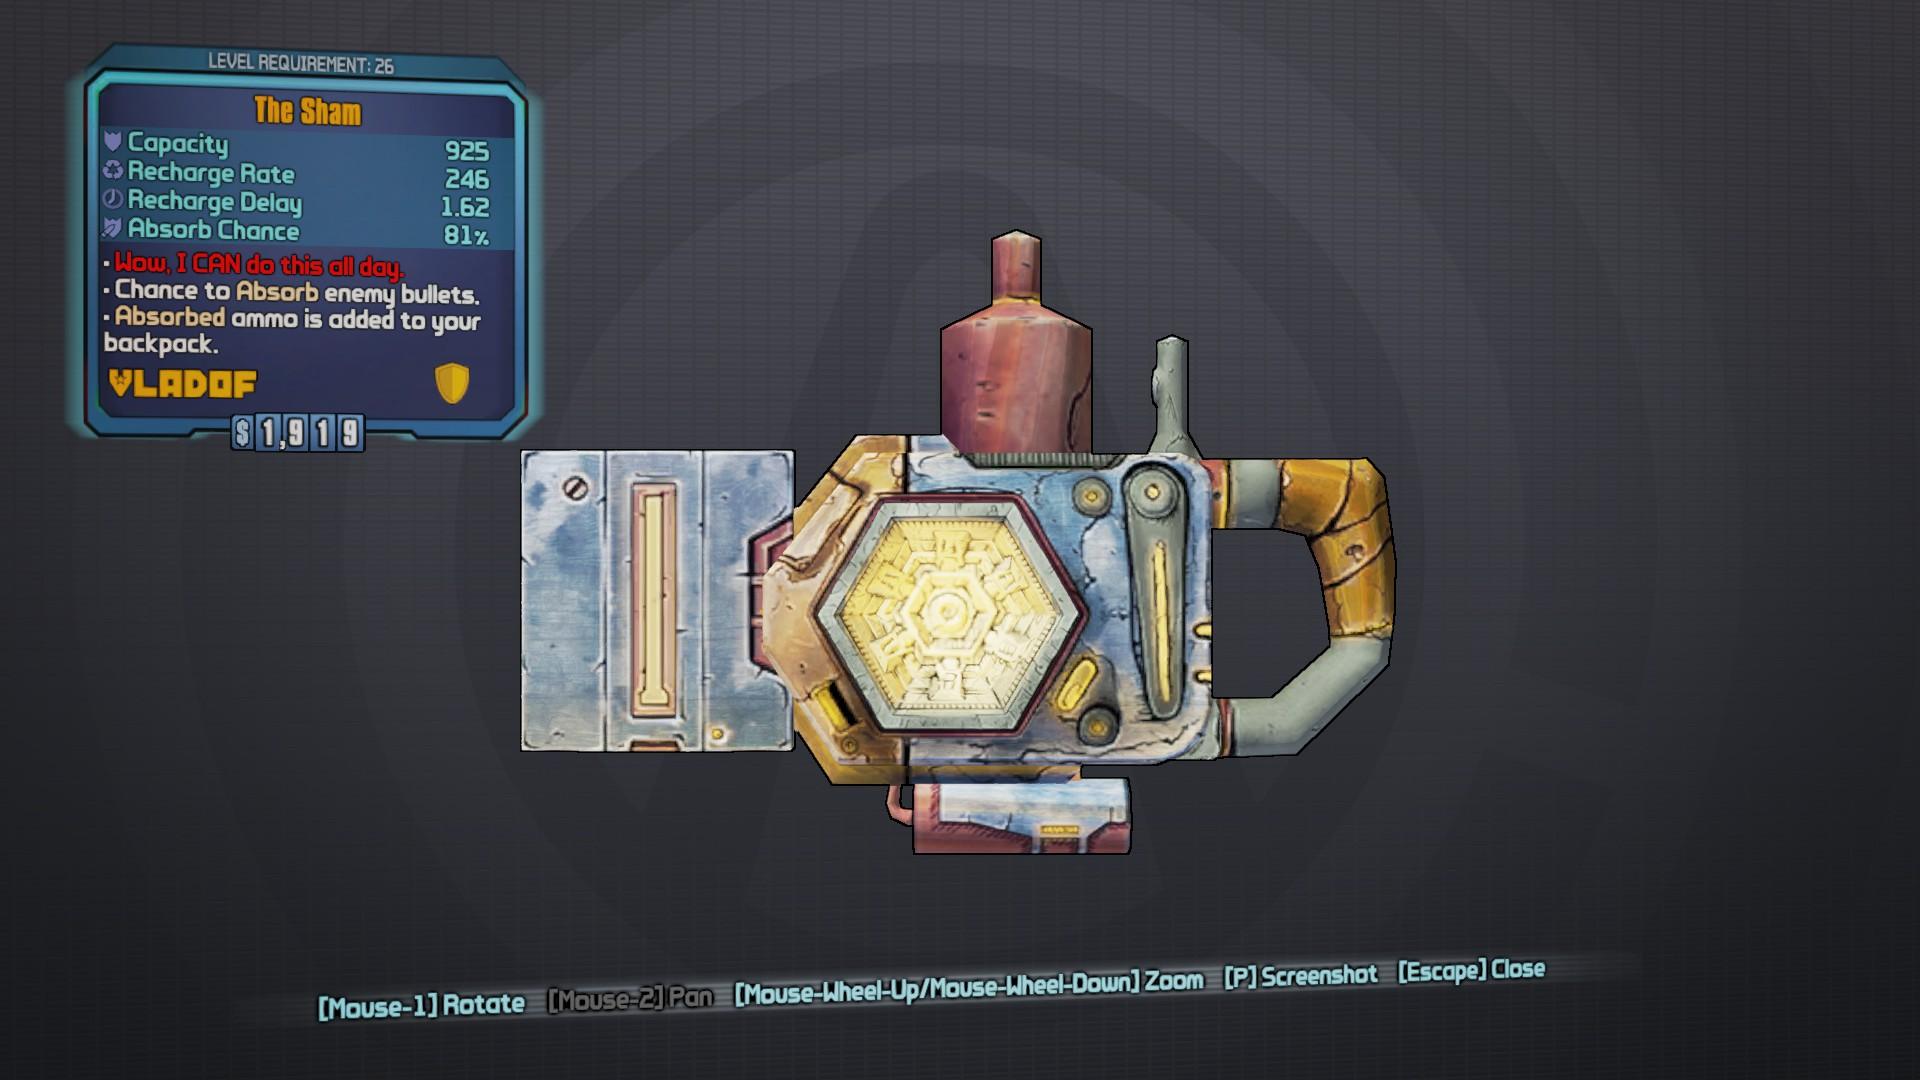 Steam Community: Borderlands 2 Shift Codes Steam Community